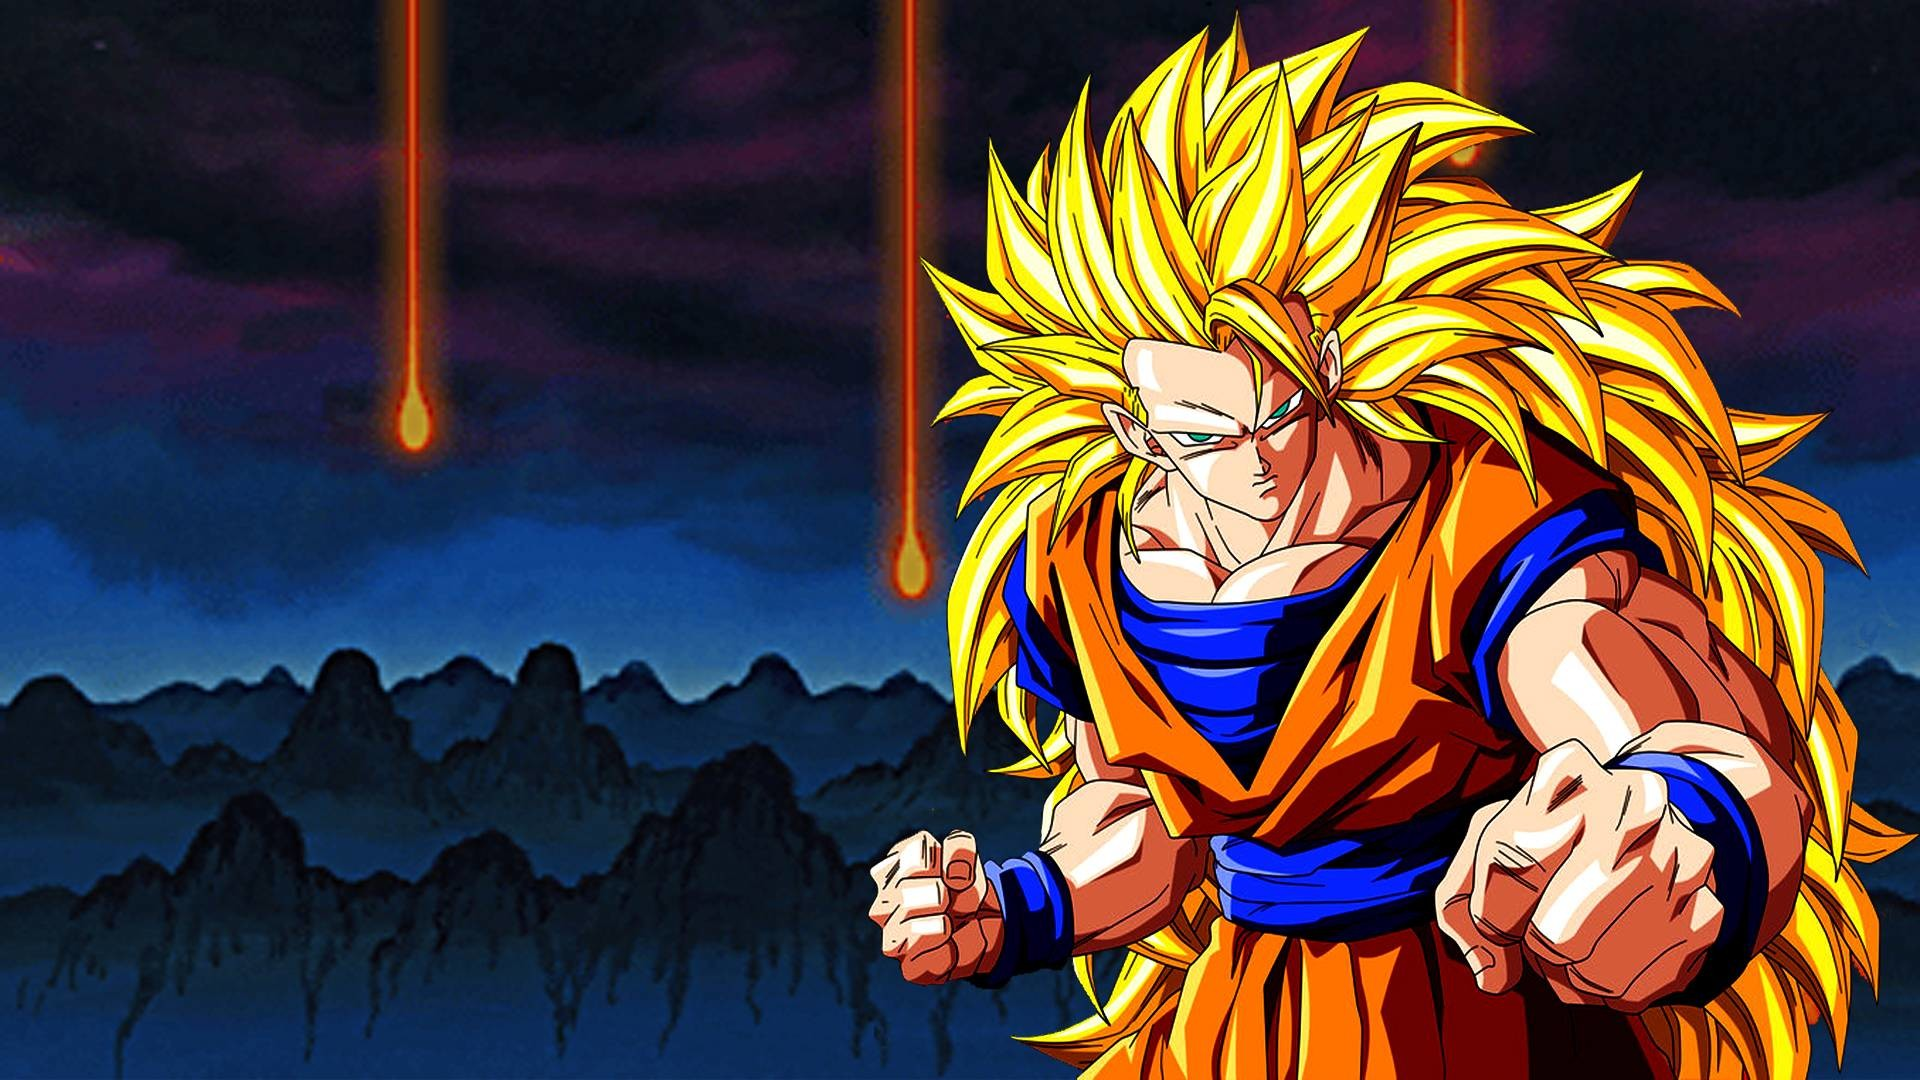 Dragon Ball Z Goku Wallpaper Full HD